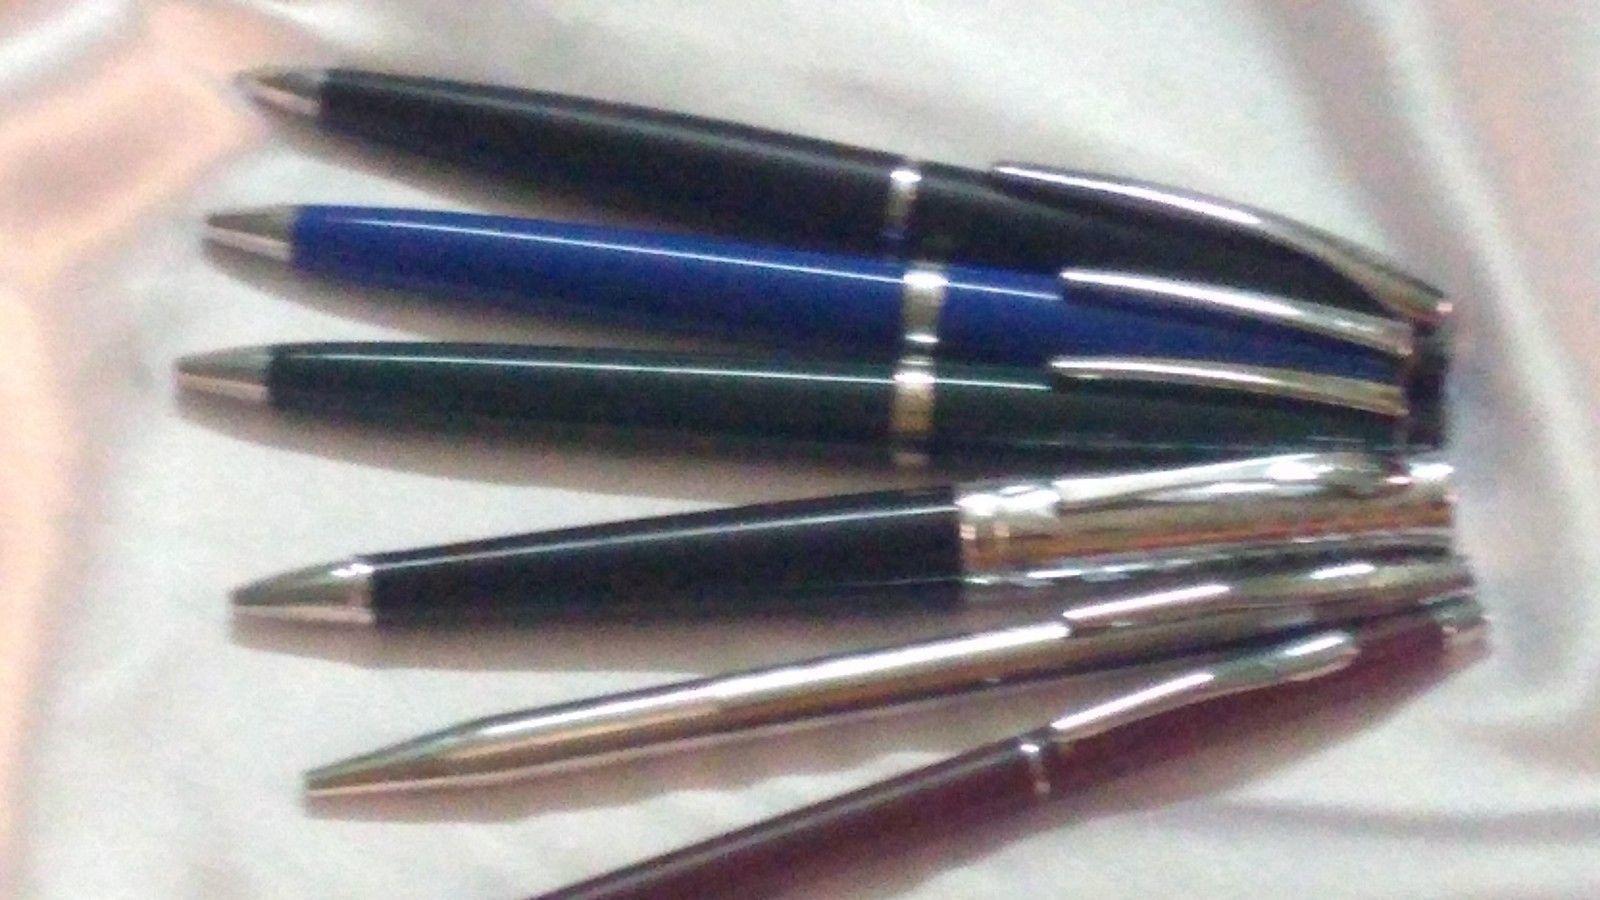 Lot of 6 pc Cross ballpoint pen